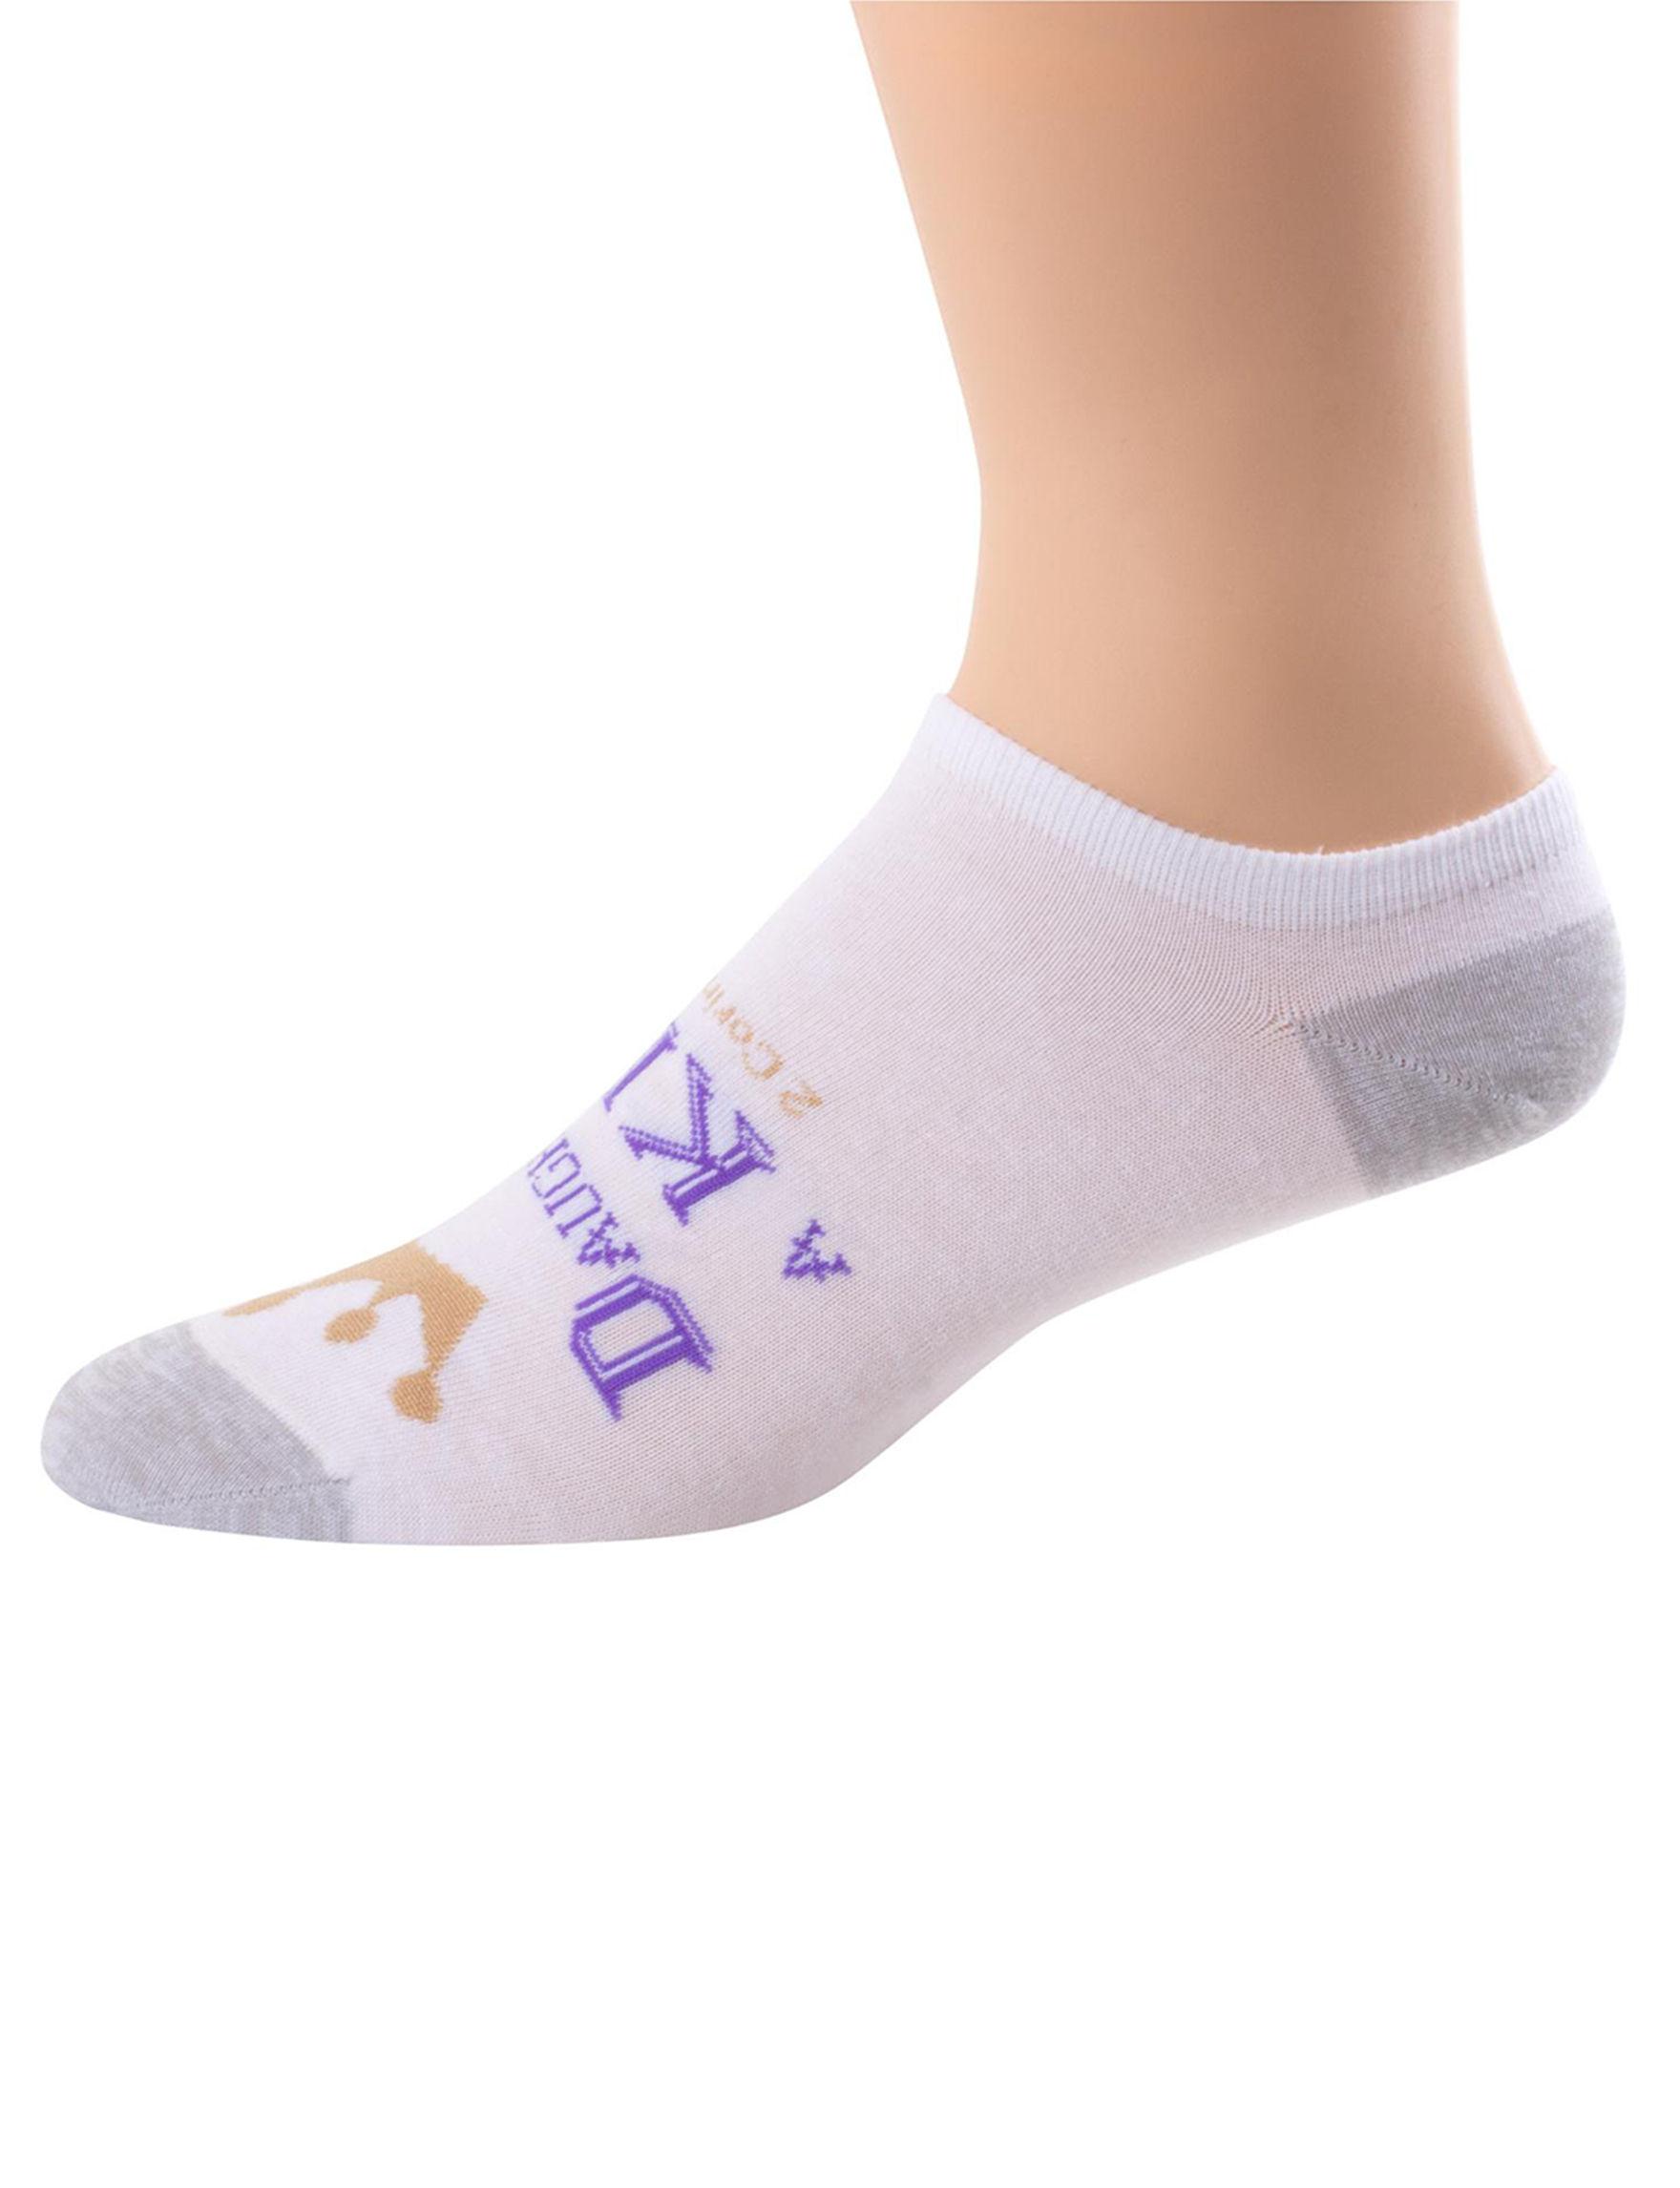 Faith & Hope White / Purple Socks